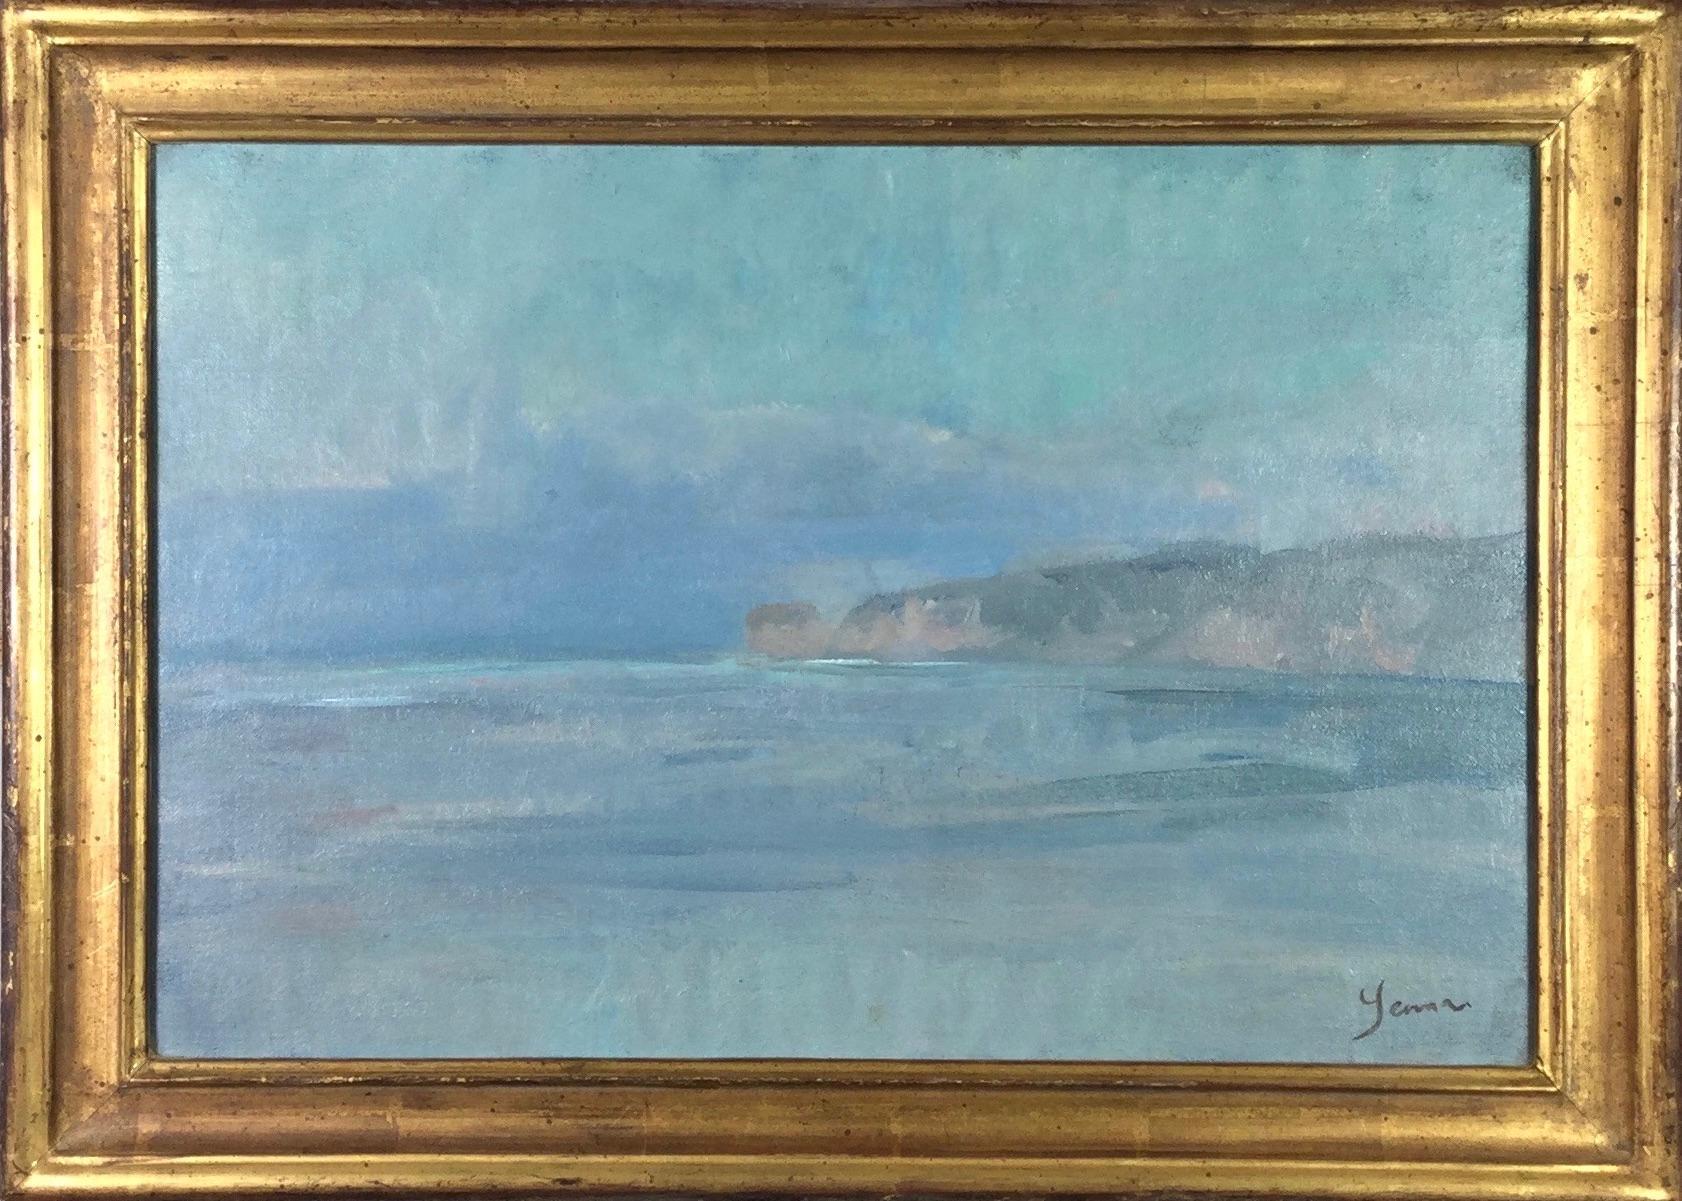 Studland Dusk, 2008, Martin Yeoman. seascape oil painting